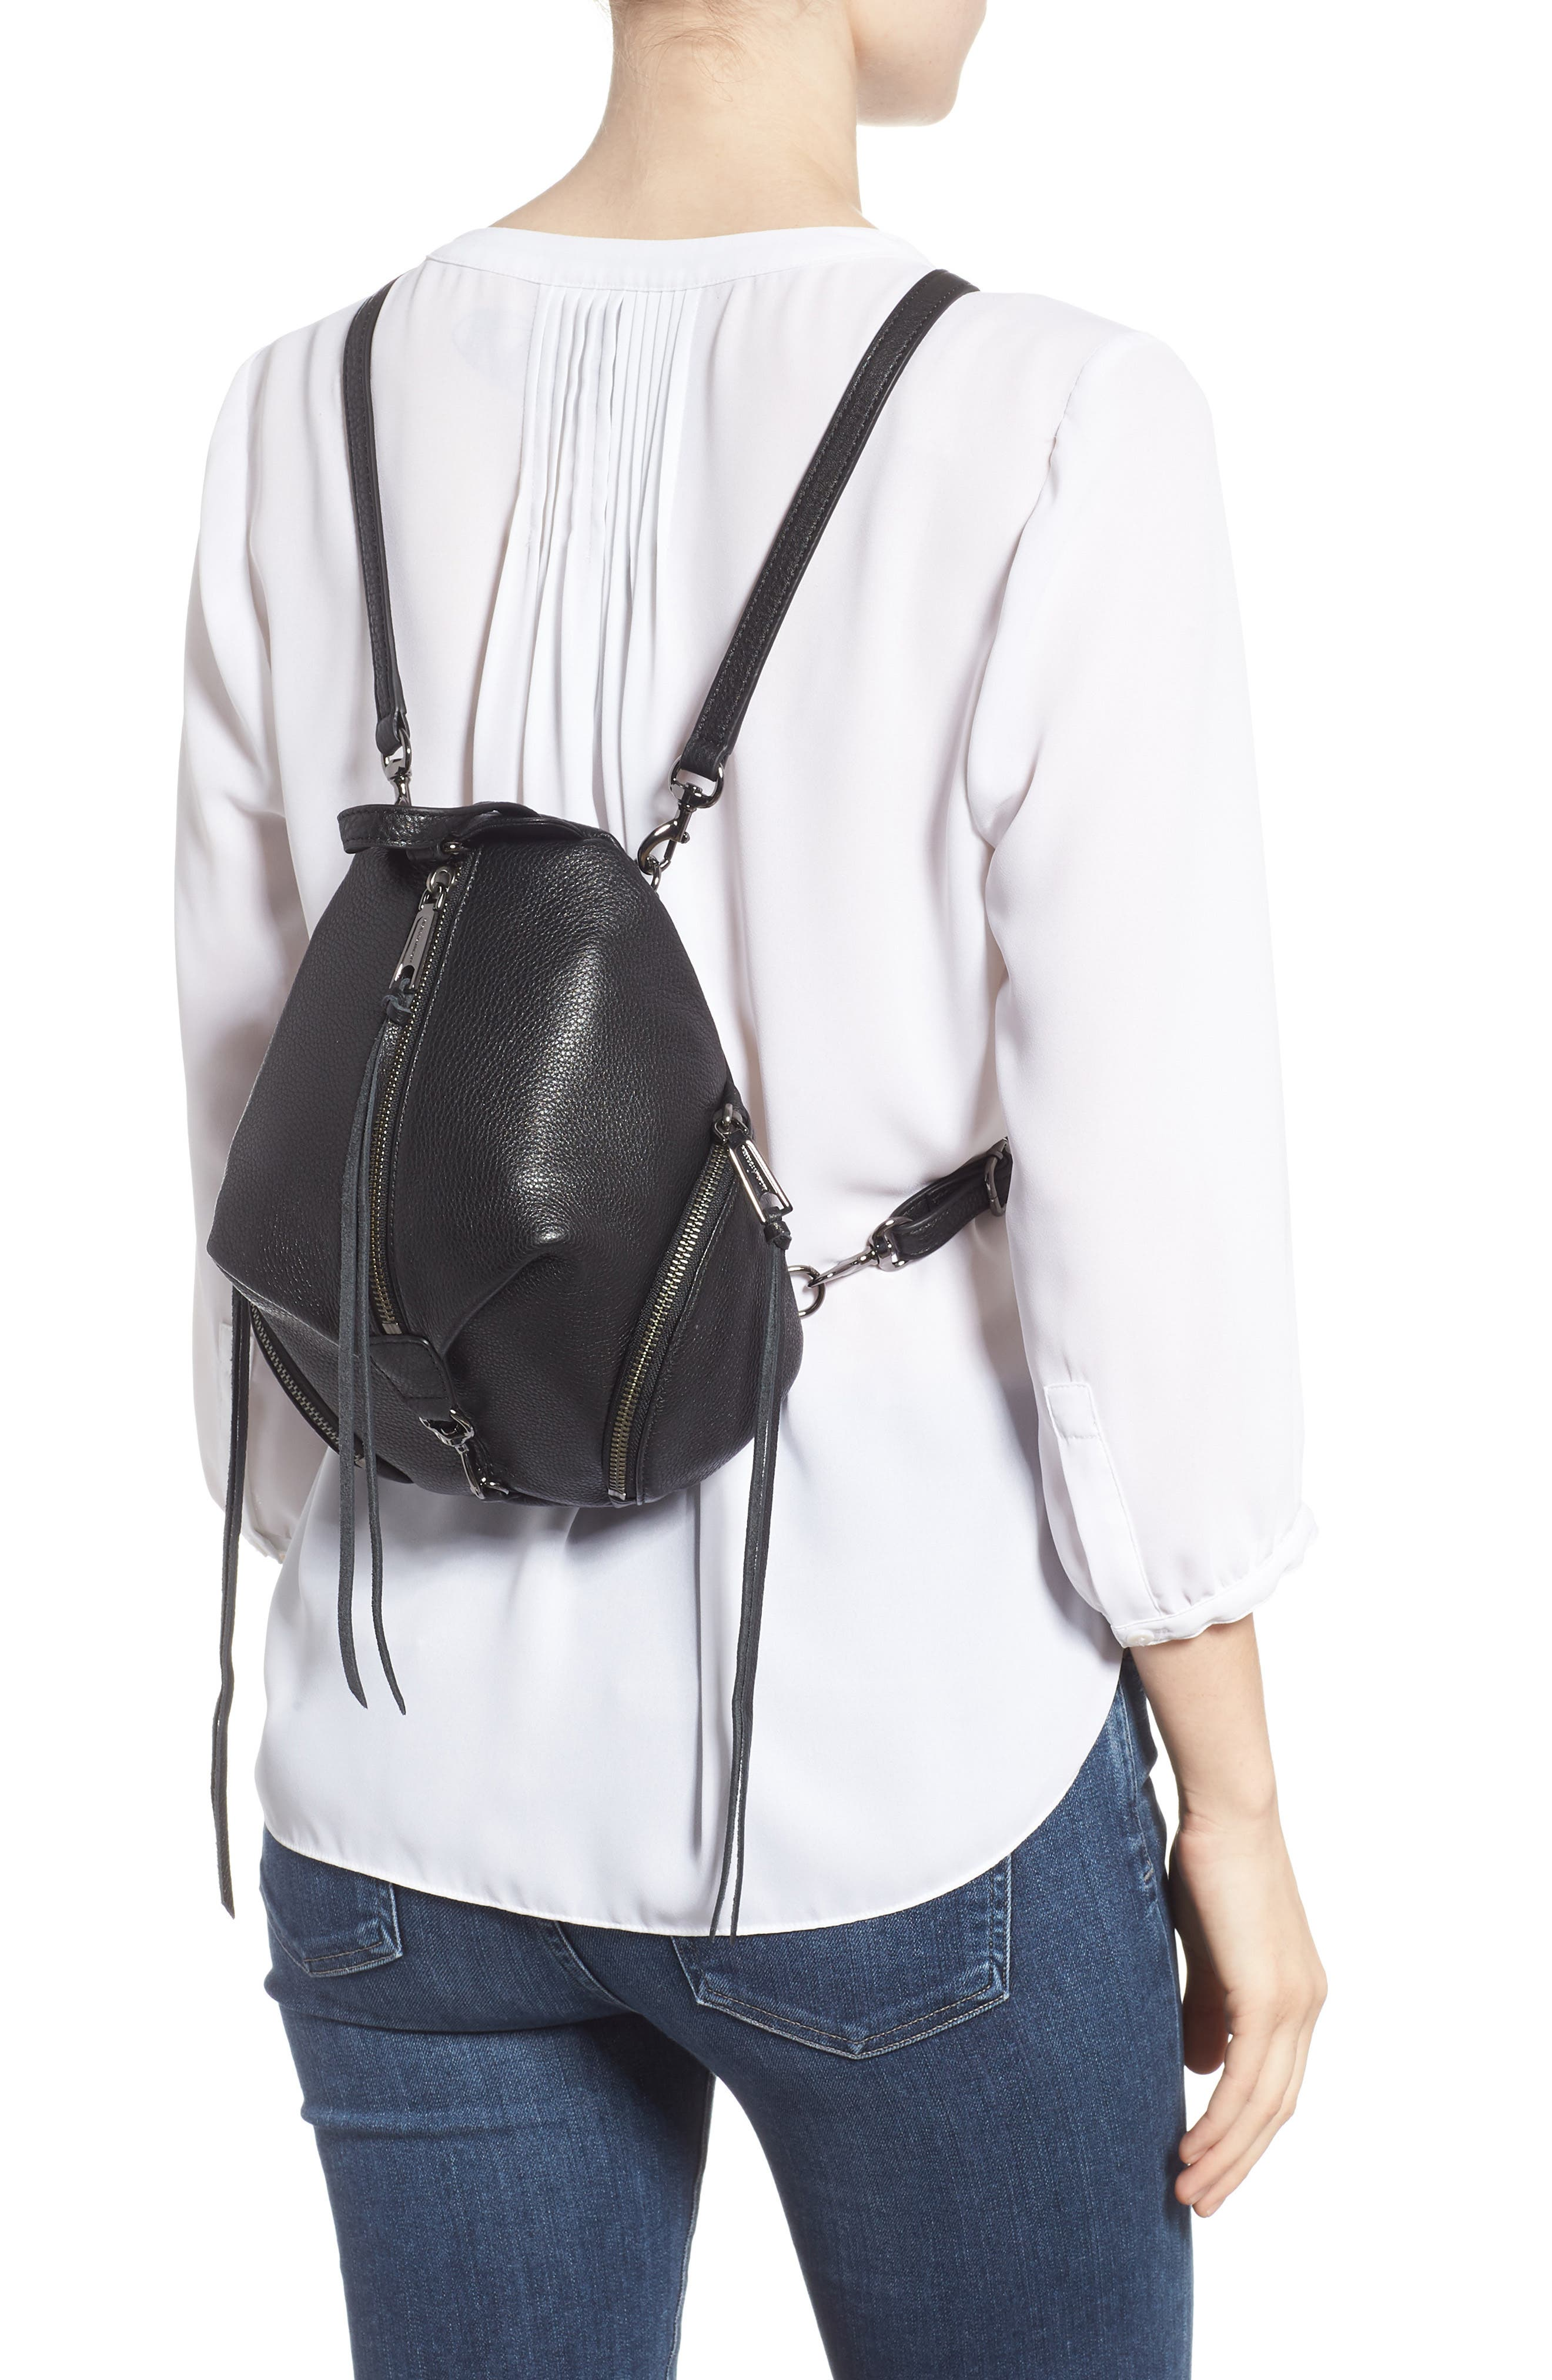 REBECCA MINKOFF, Mini Julian Pebbled Leather Convertible Backpack, Alternate thumbnail 4, color, BLACK